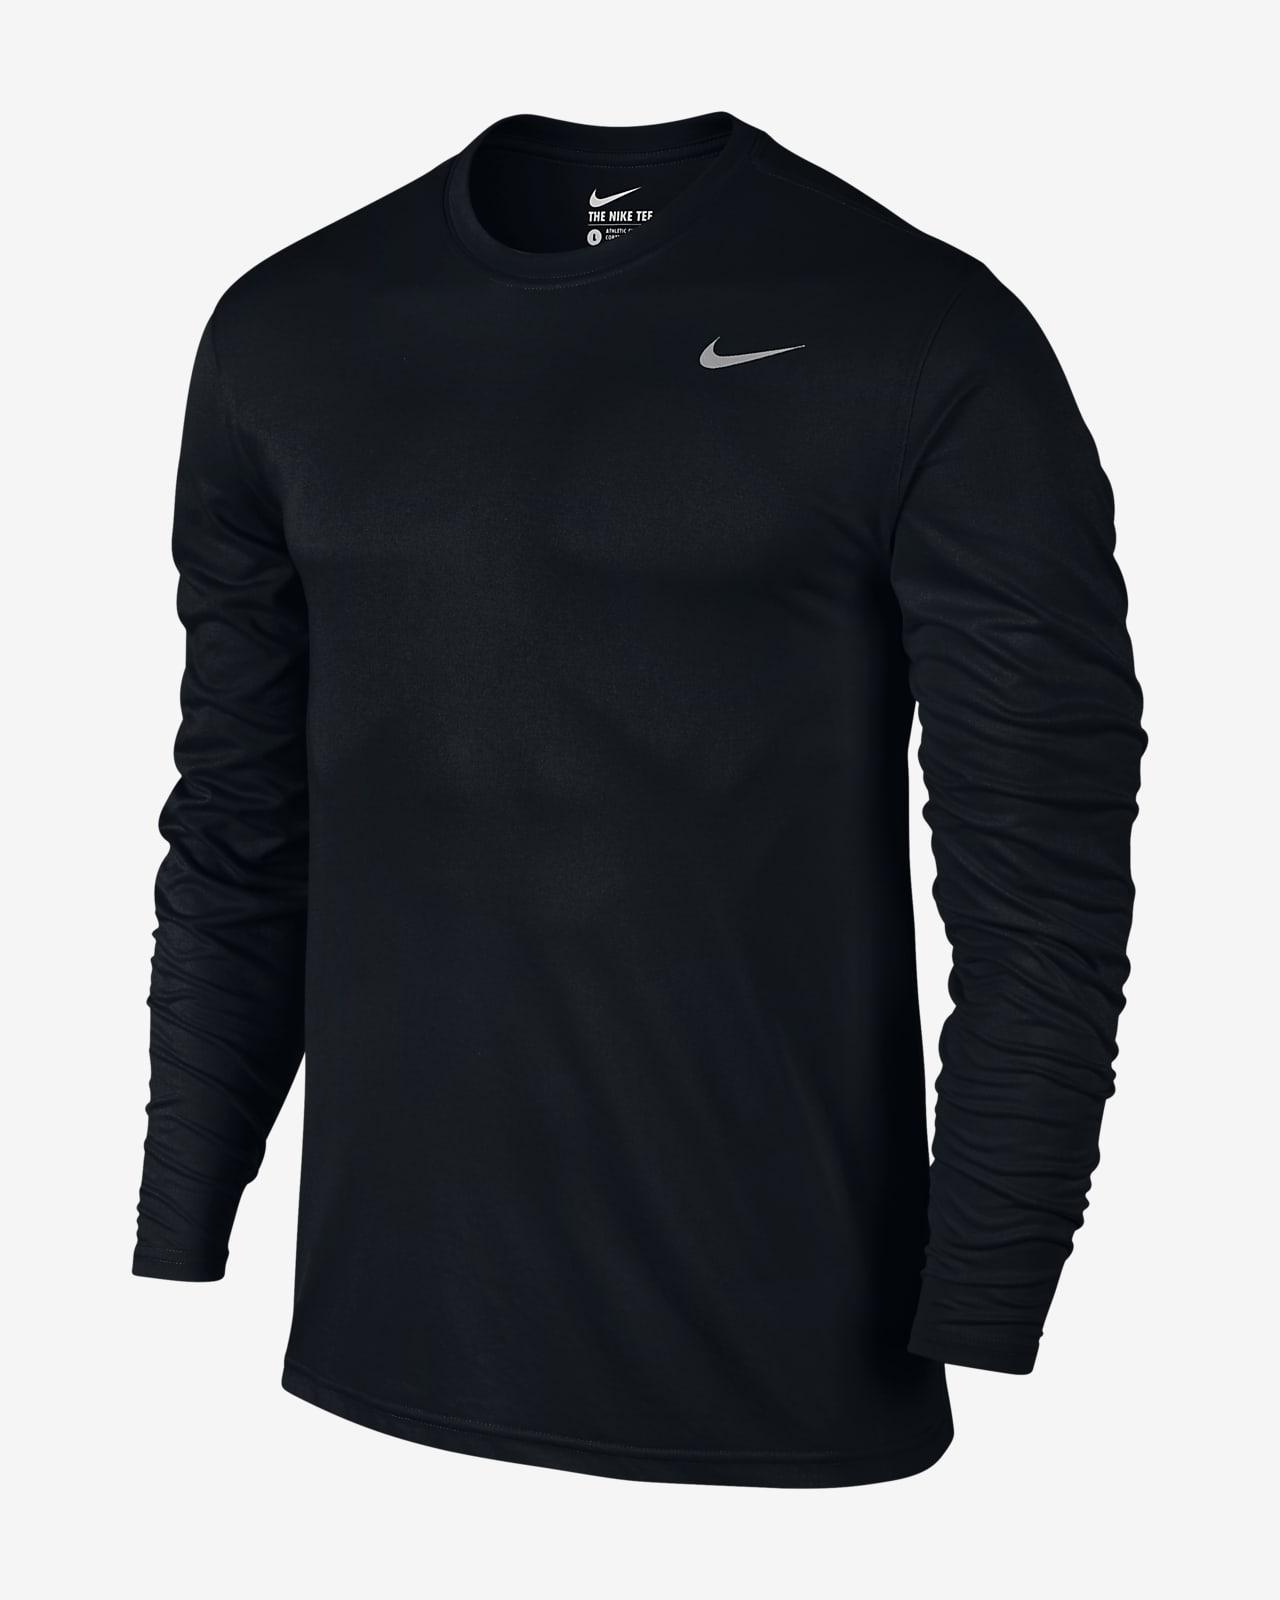 Nike Dri-FIT Men's Long-Sleeve Training T-Shirt